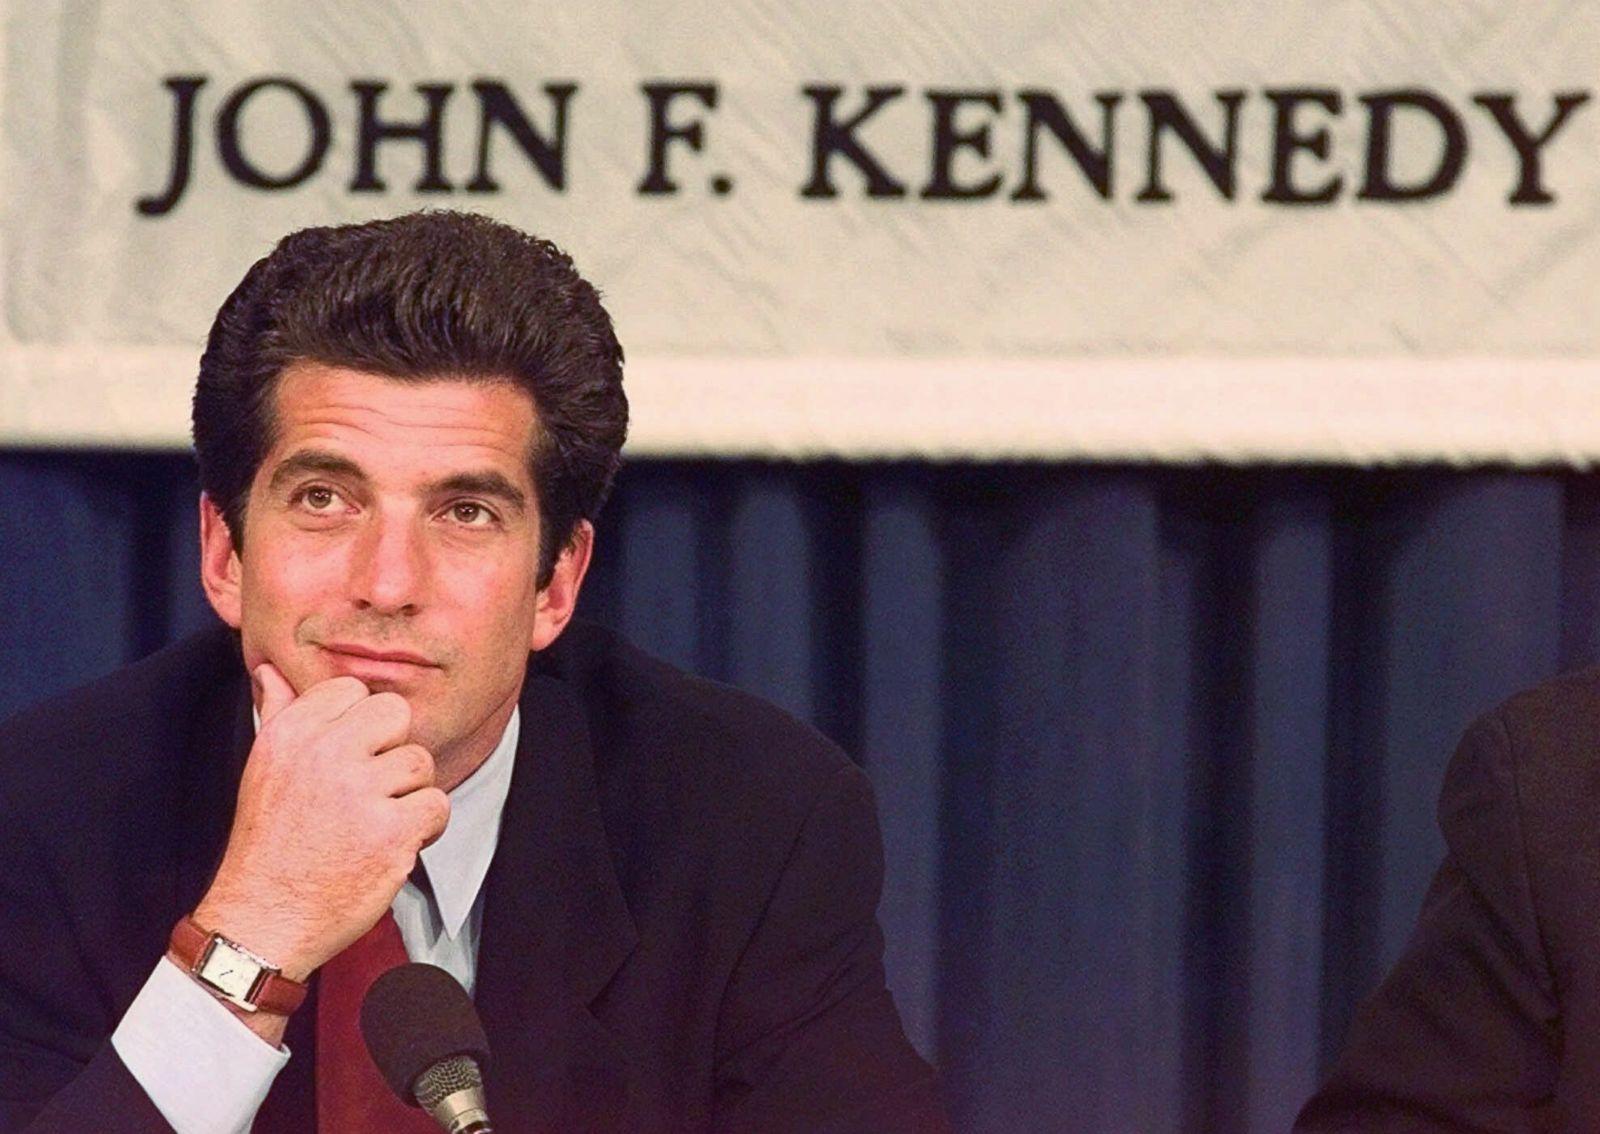 F kennedy john president